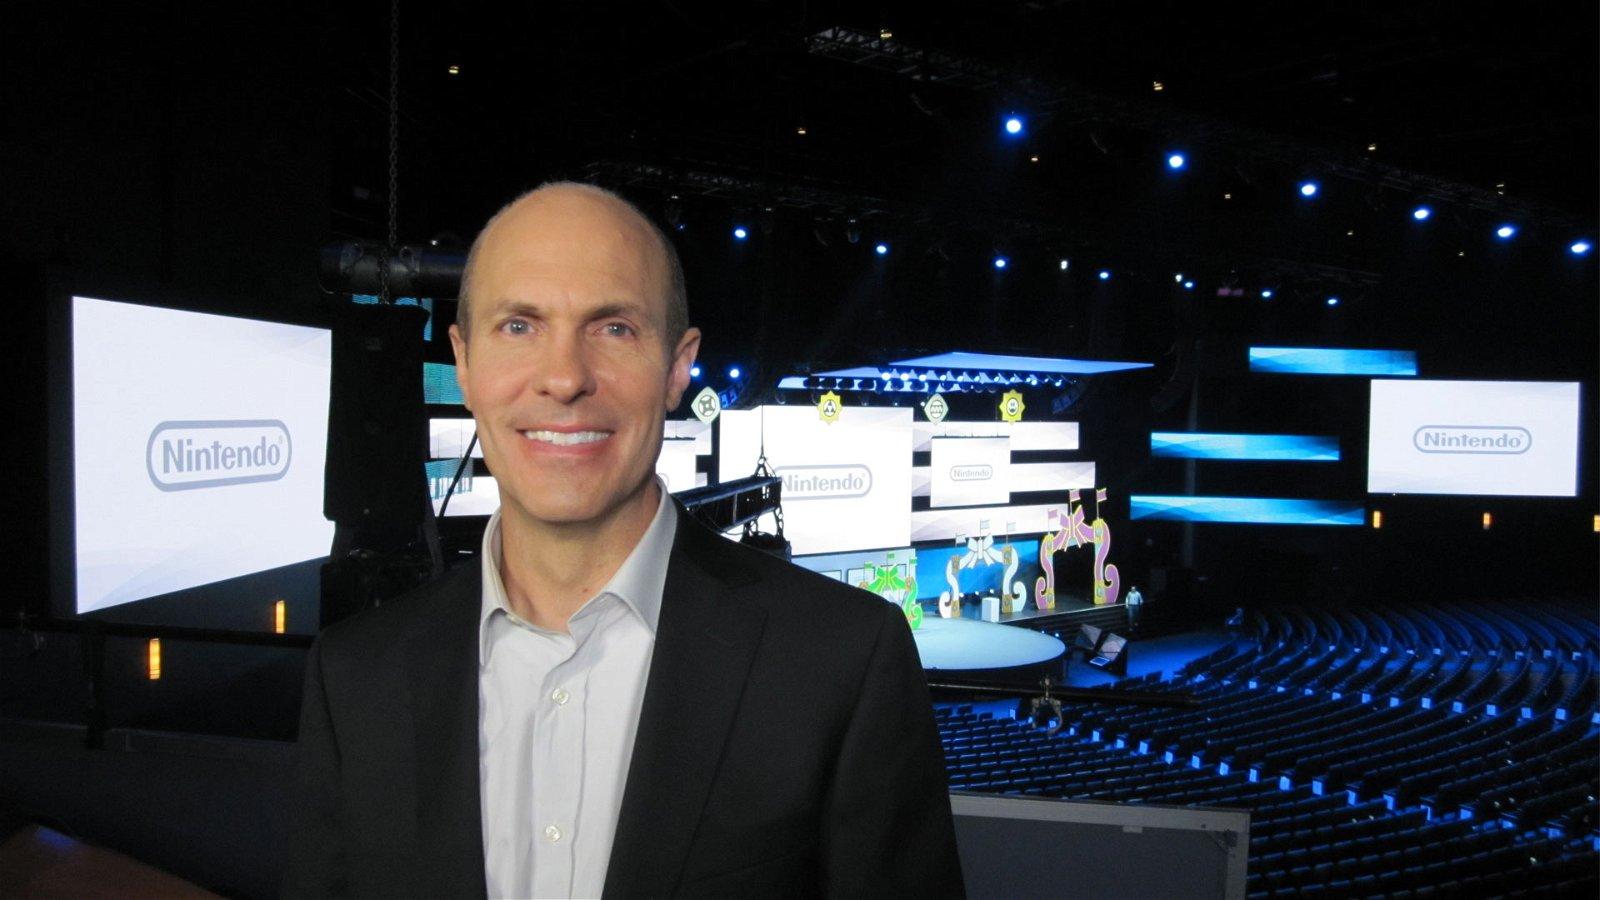 VP Of Sales And Marketing, Scott Moffitt, Leaves Nintendo 1